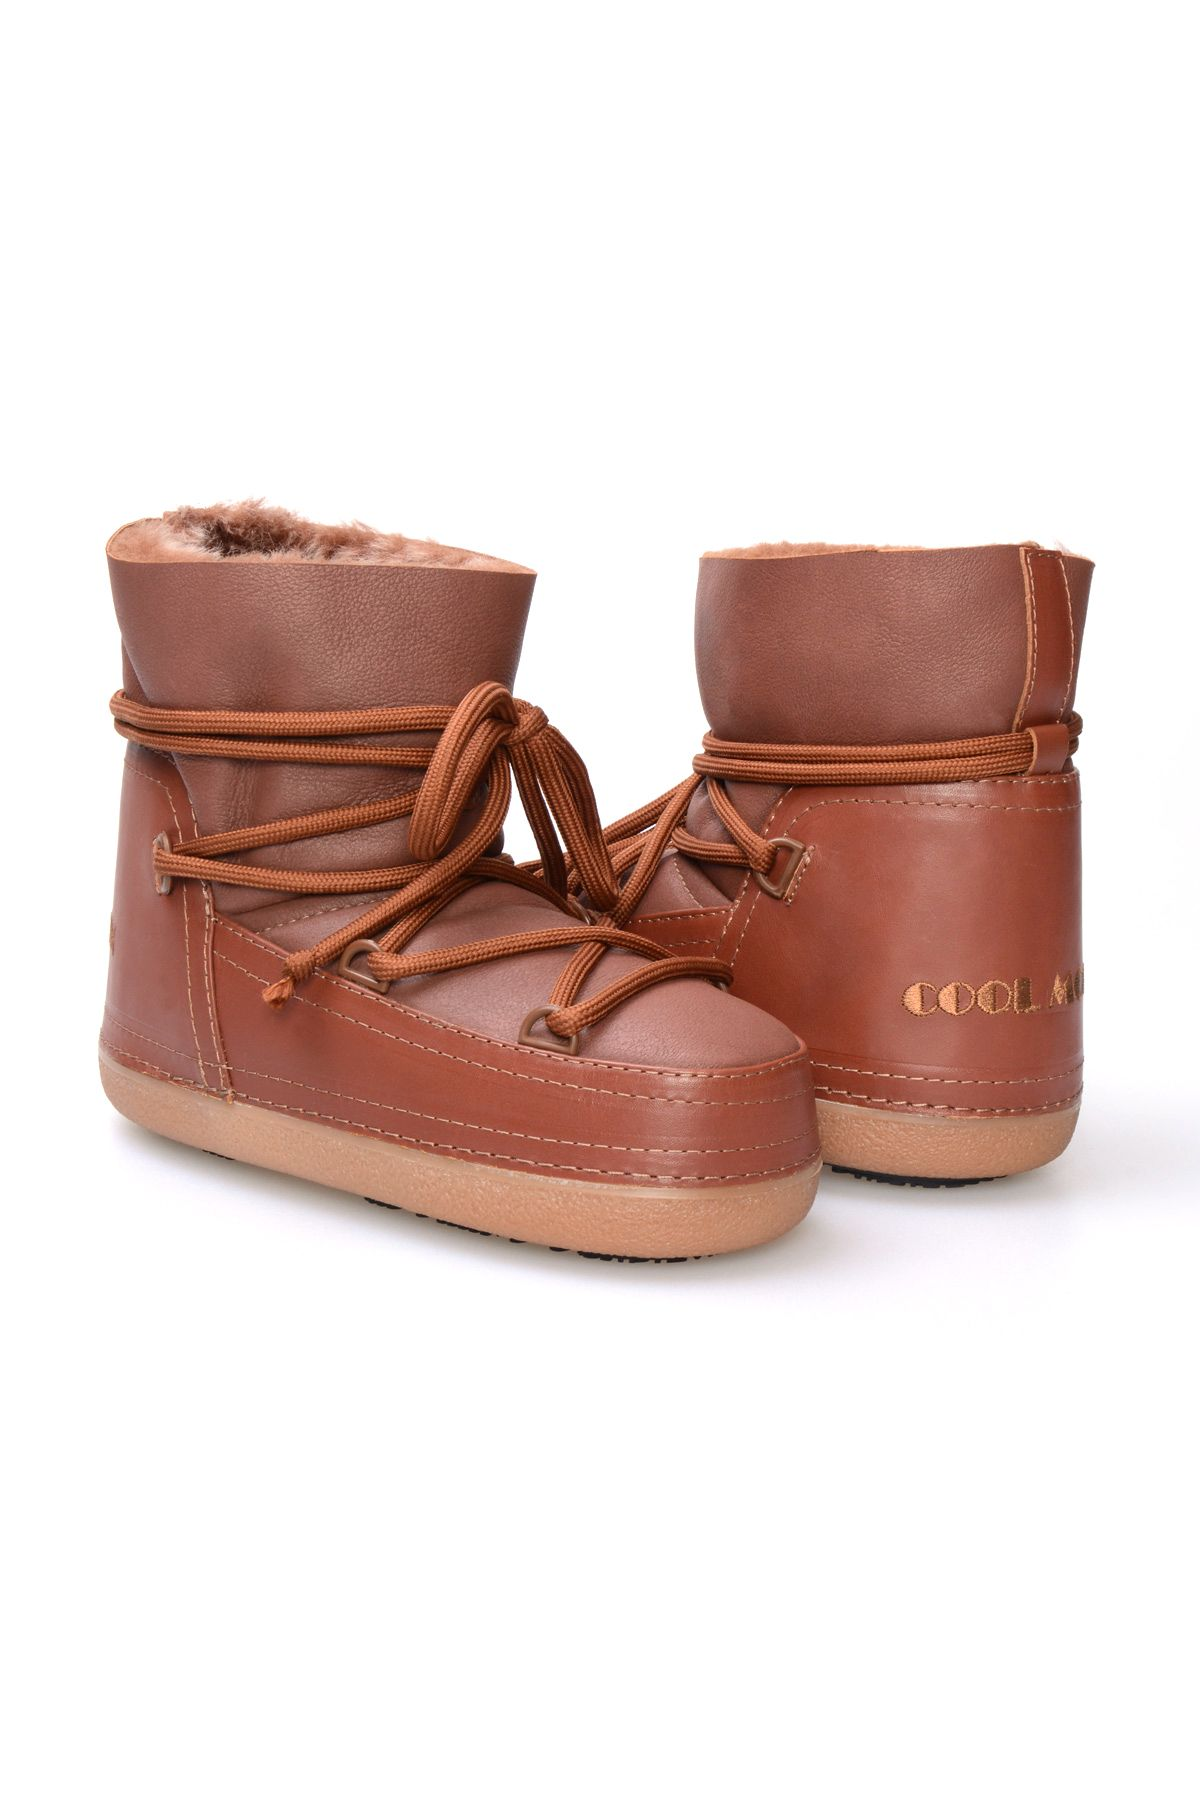 Cool Moon Women's Sheepskin Boots 251046 Brick-red